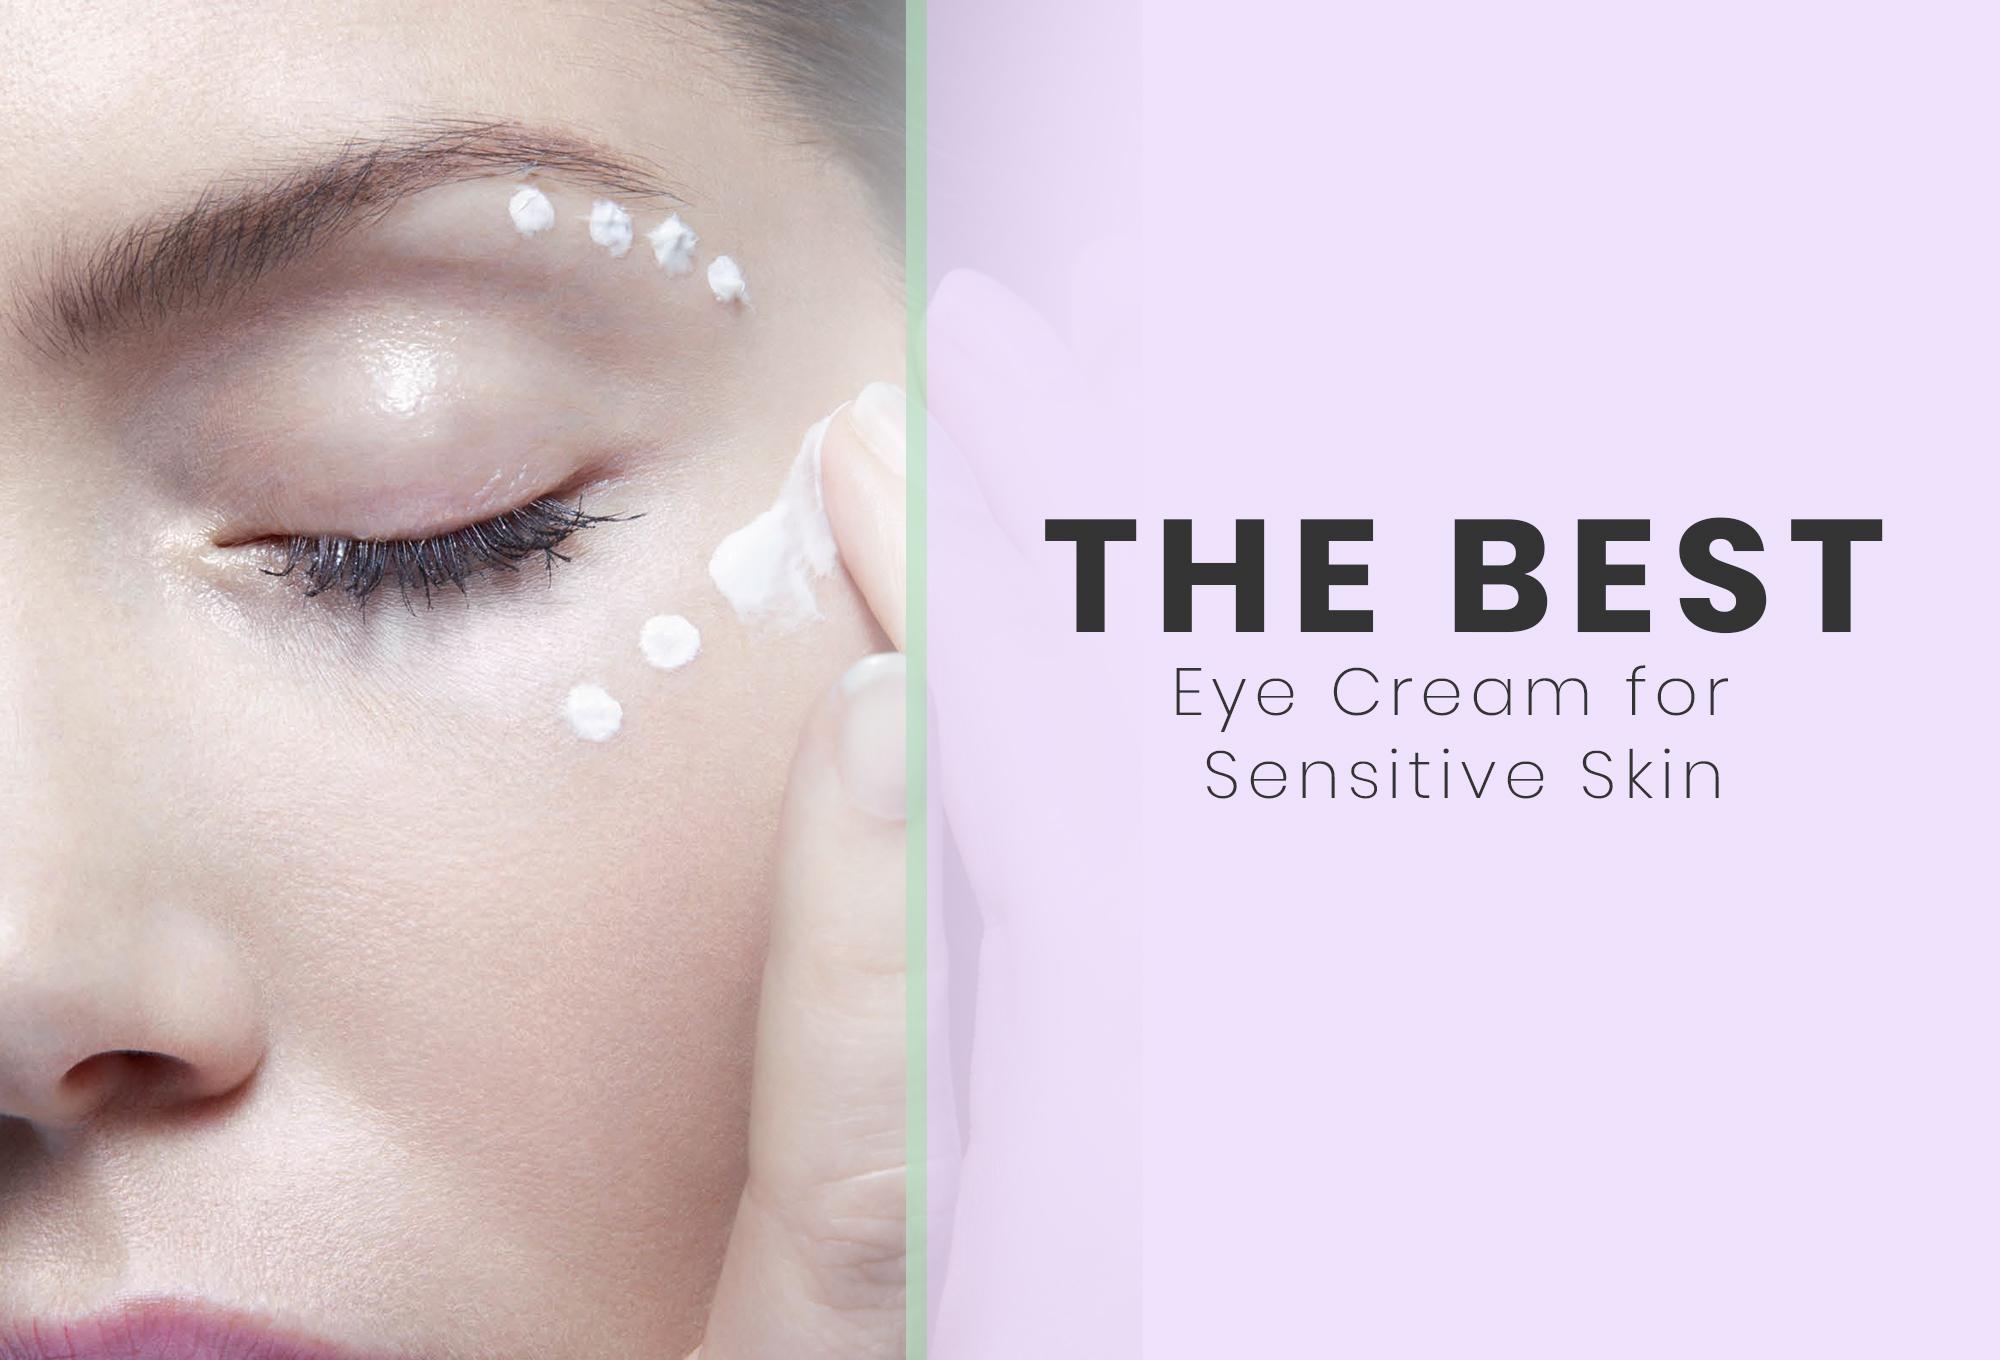 Best Eye Cream 2019 Best Eye Cream for Sensitive Skin – July, 2019 Reviews & Buyers